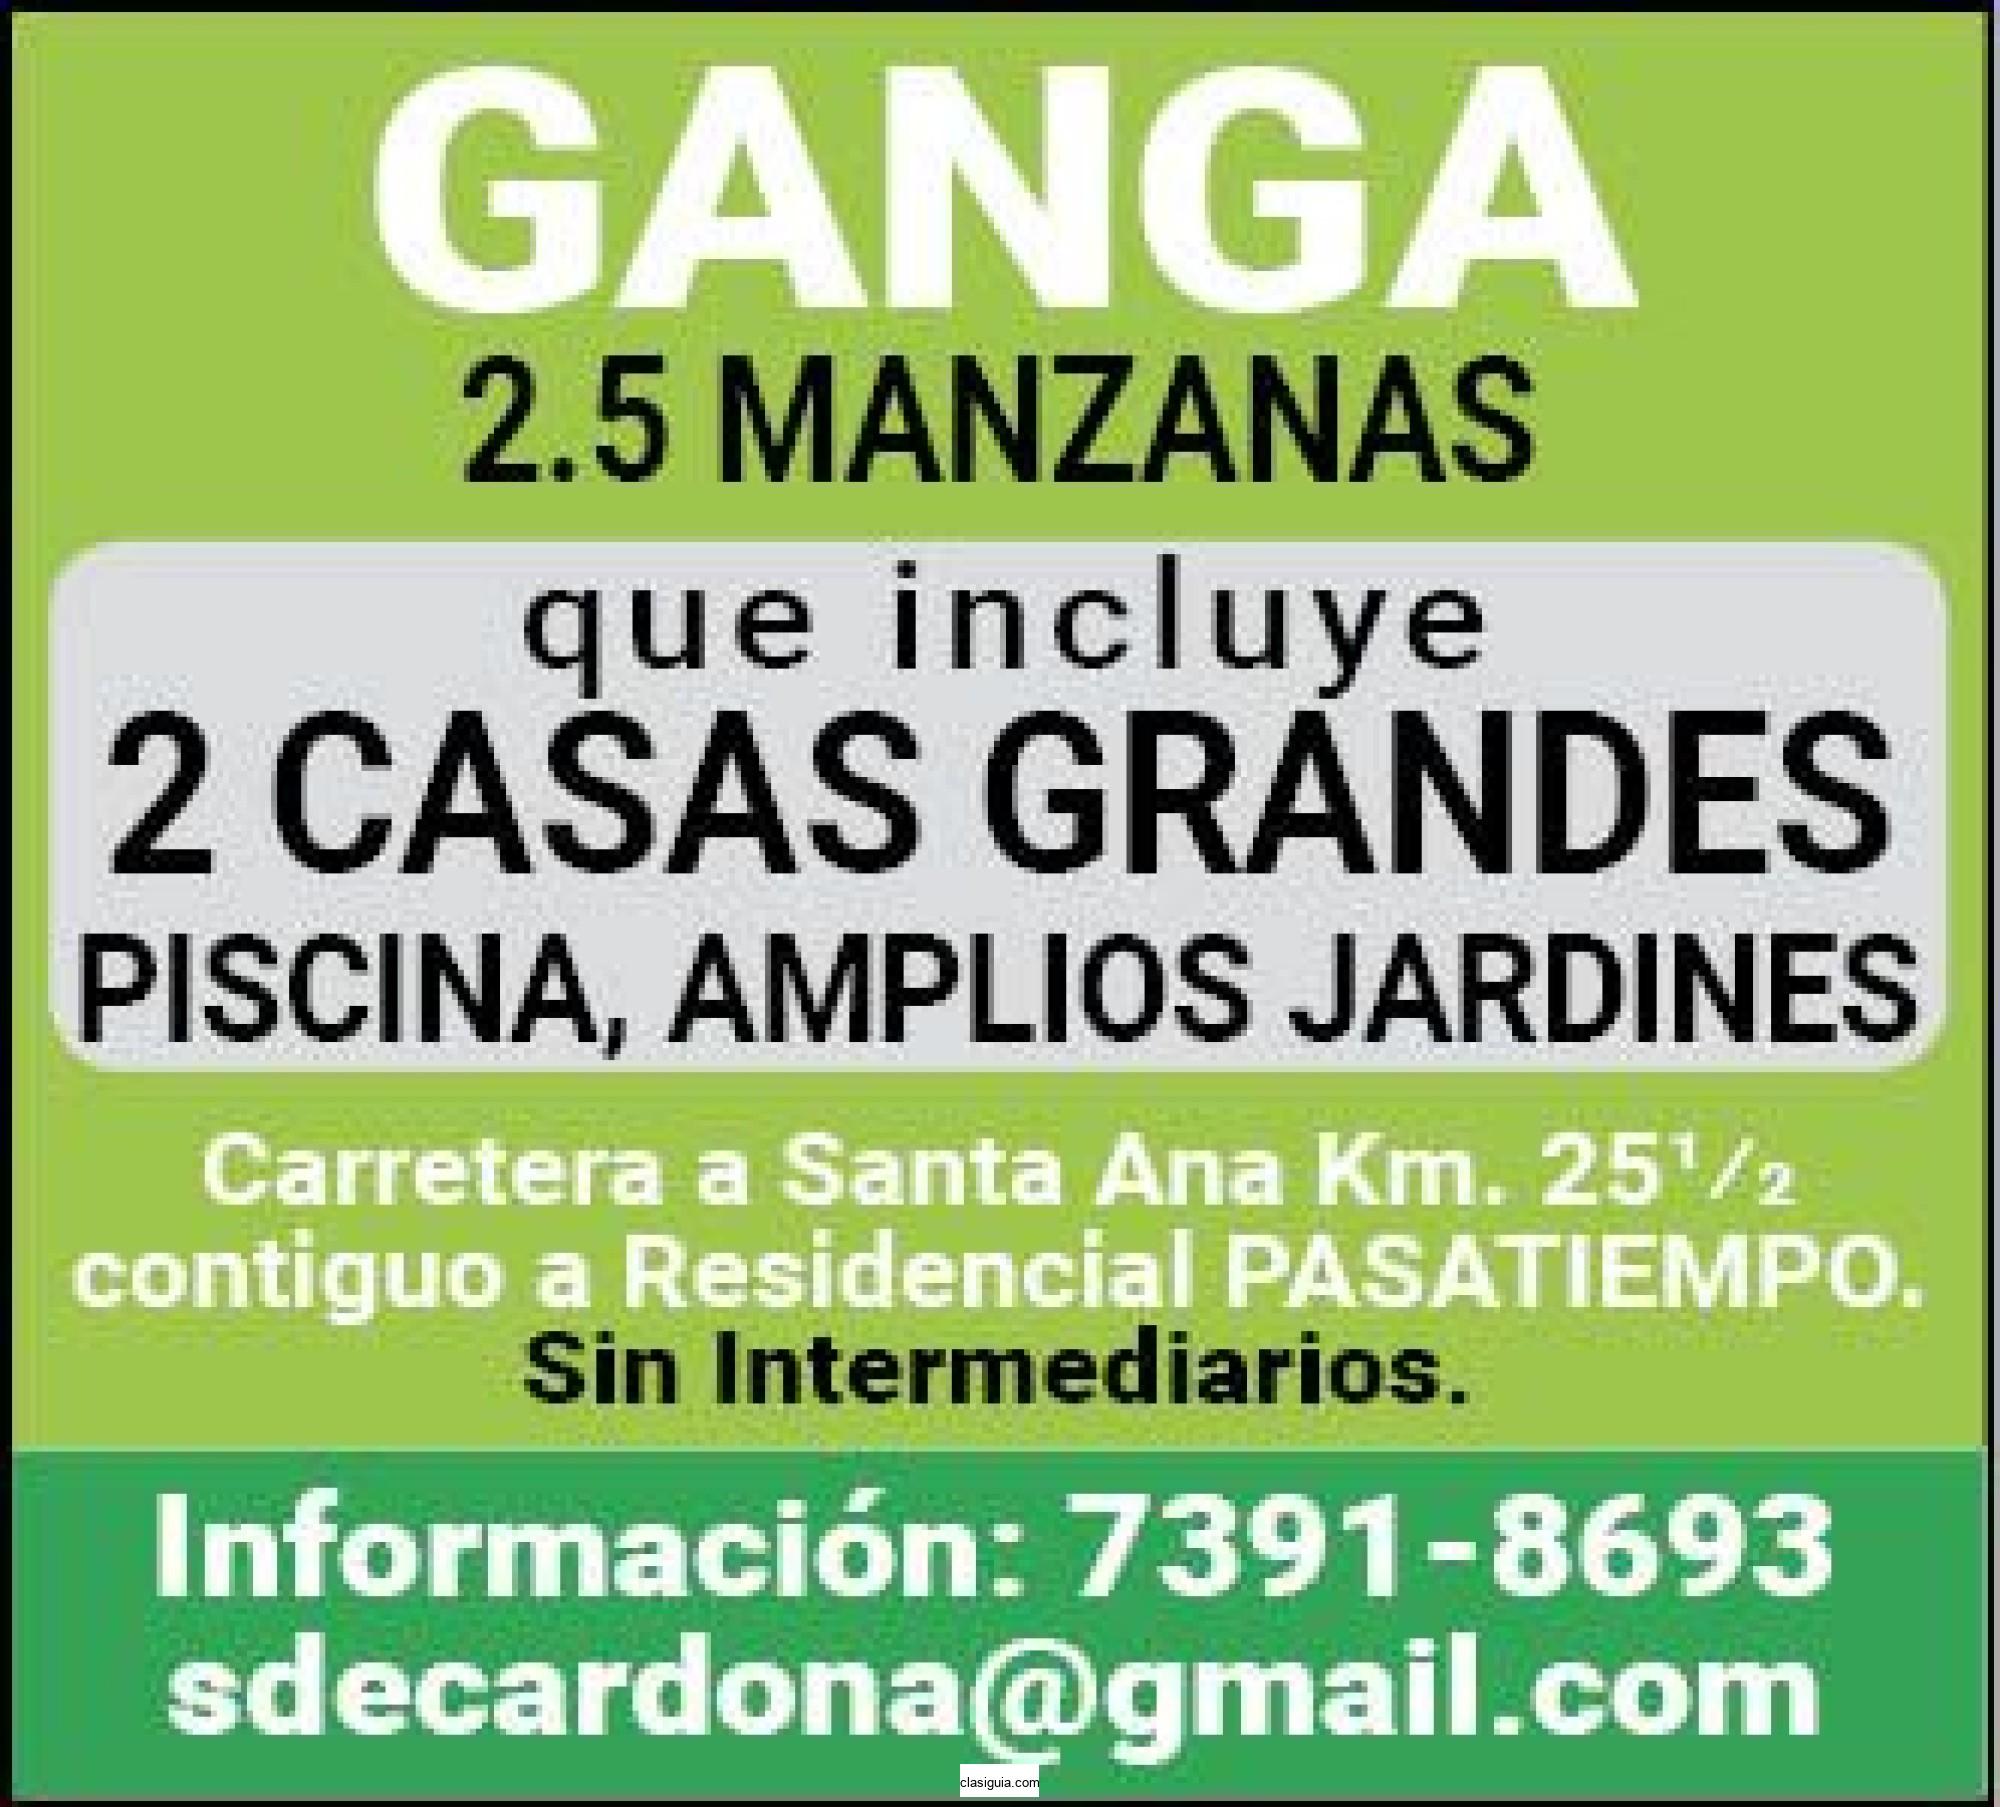 GANGA 2.5 MANZANAS